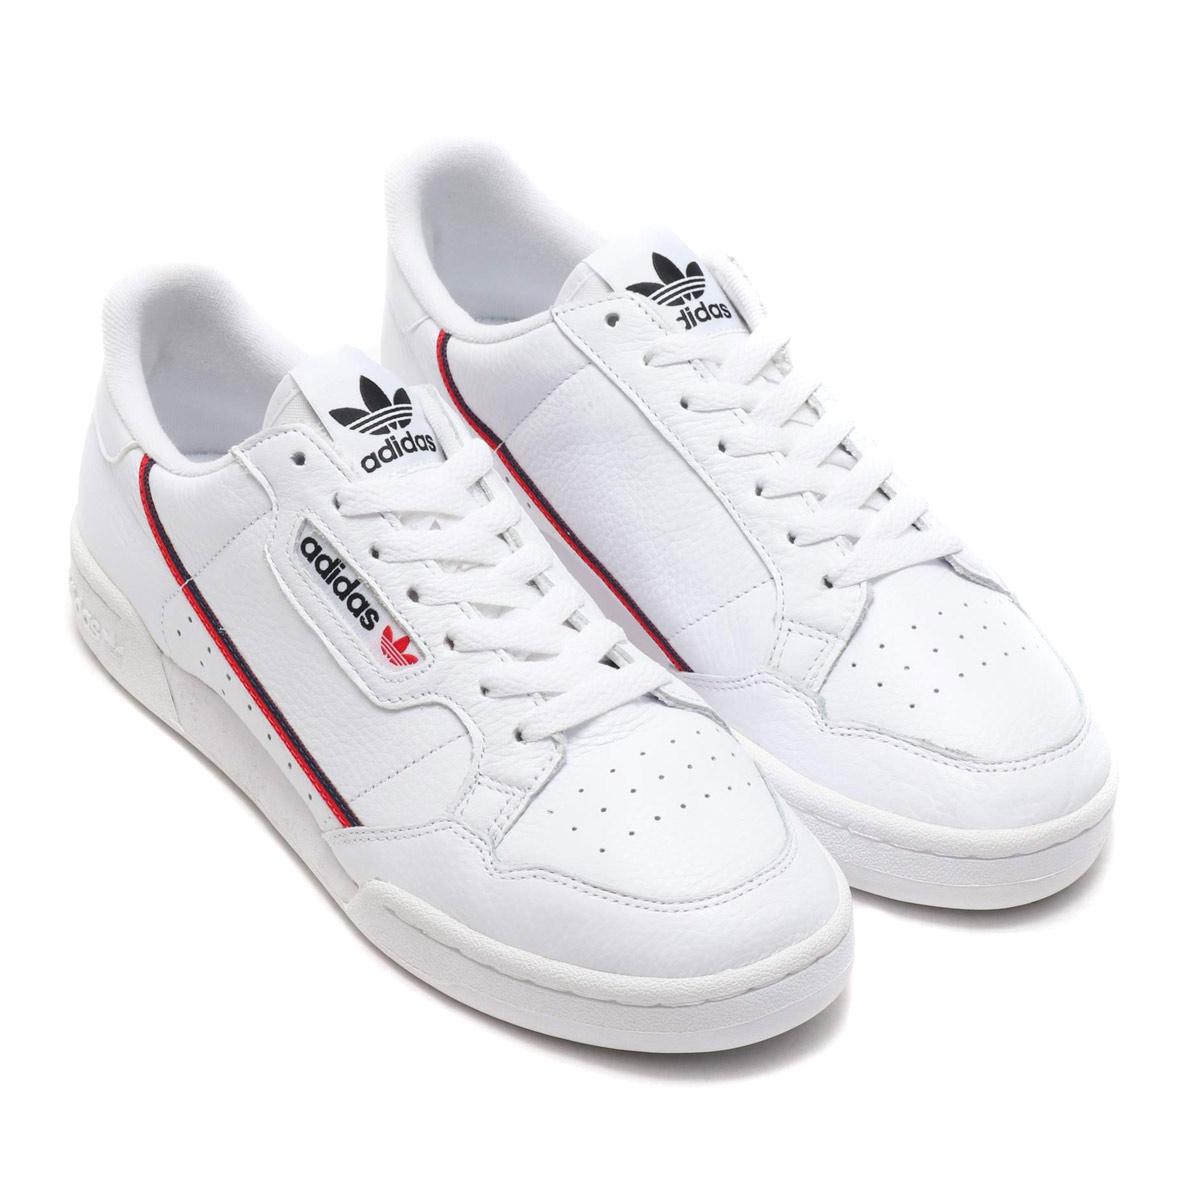 adidas Originals CONTINENTAL 80 (アディダスオリジナルス コンチネンタル 80)RUNNING WHITE/SCARLET/COLLEGE NAVY【メンズ レディース スニーカー】19SS-I